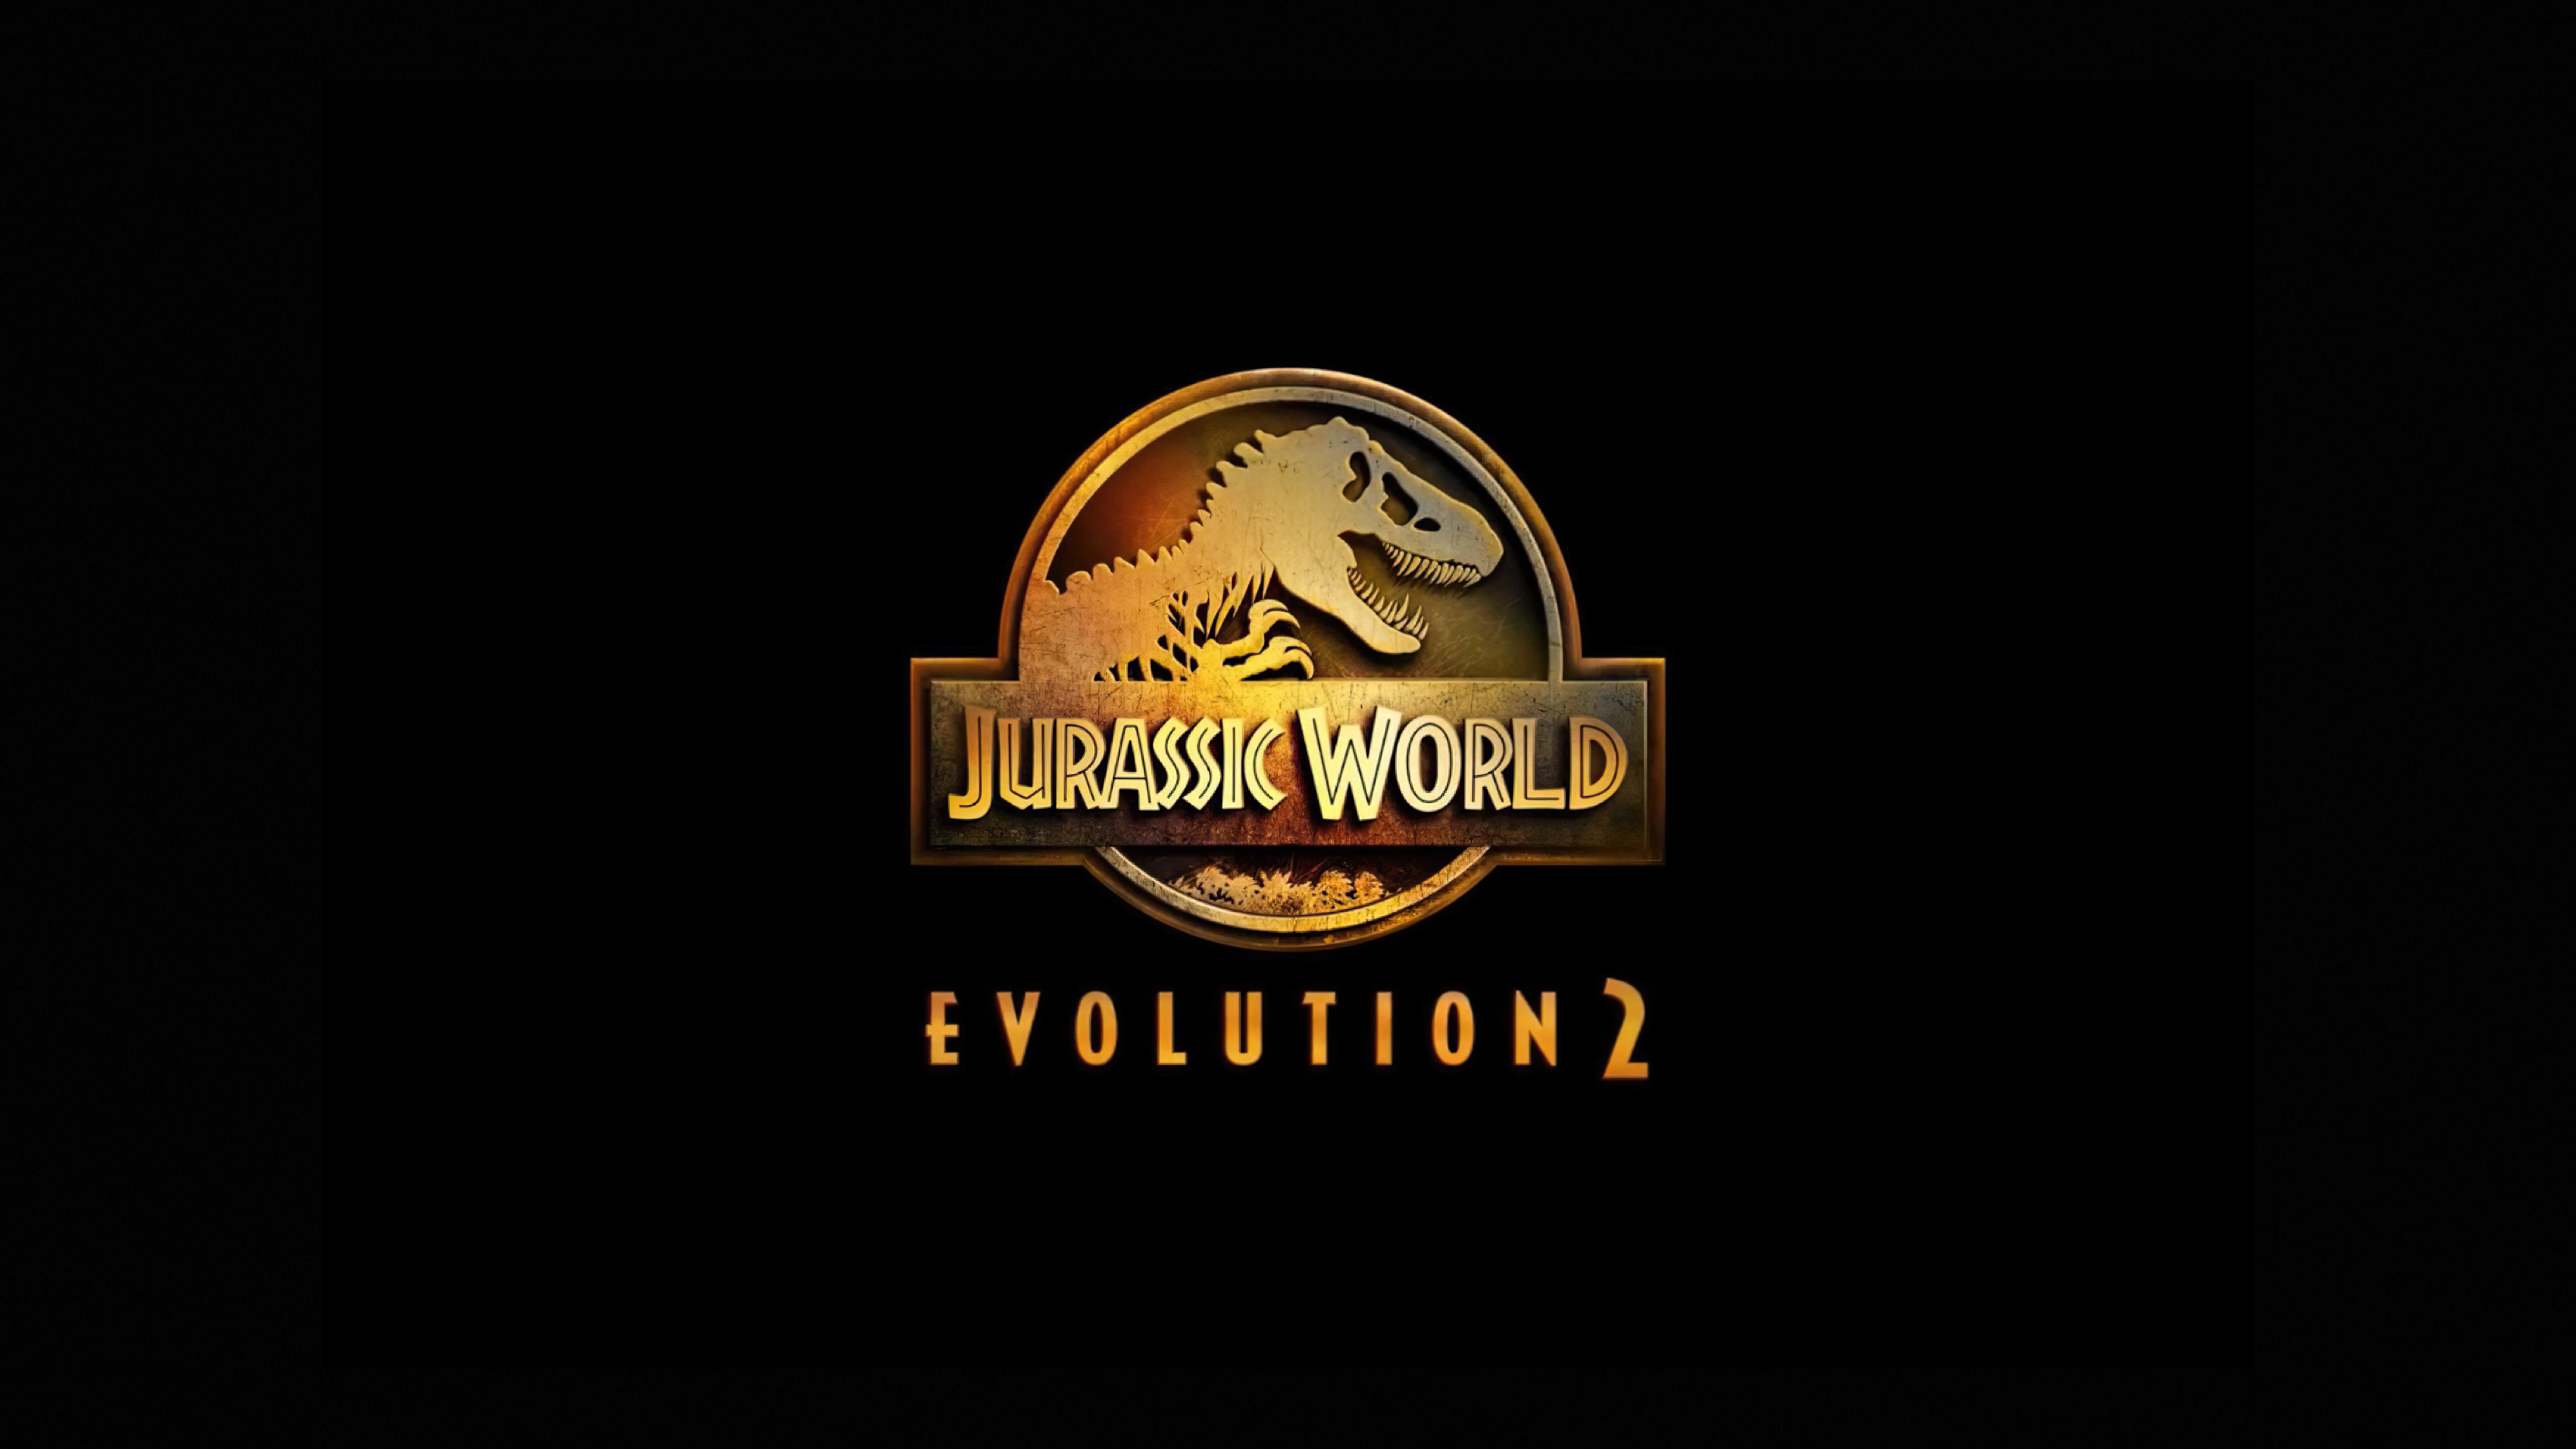 jurassic world evolution 2 4k 1628453678 - Jurassic World Evolution 2 4k - Jurassic World Evolution 2 4k wallpapers